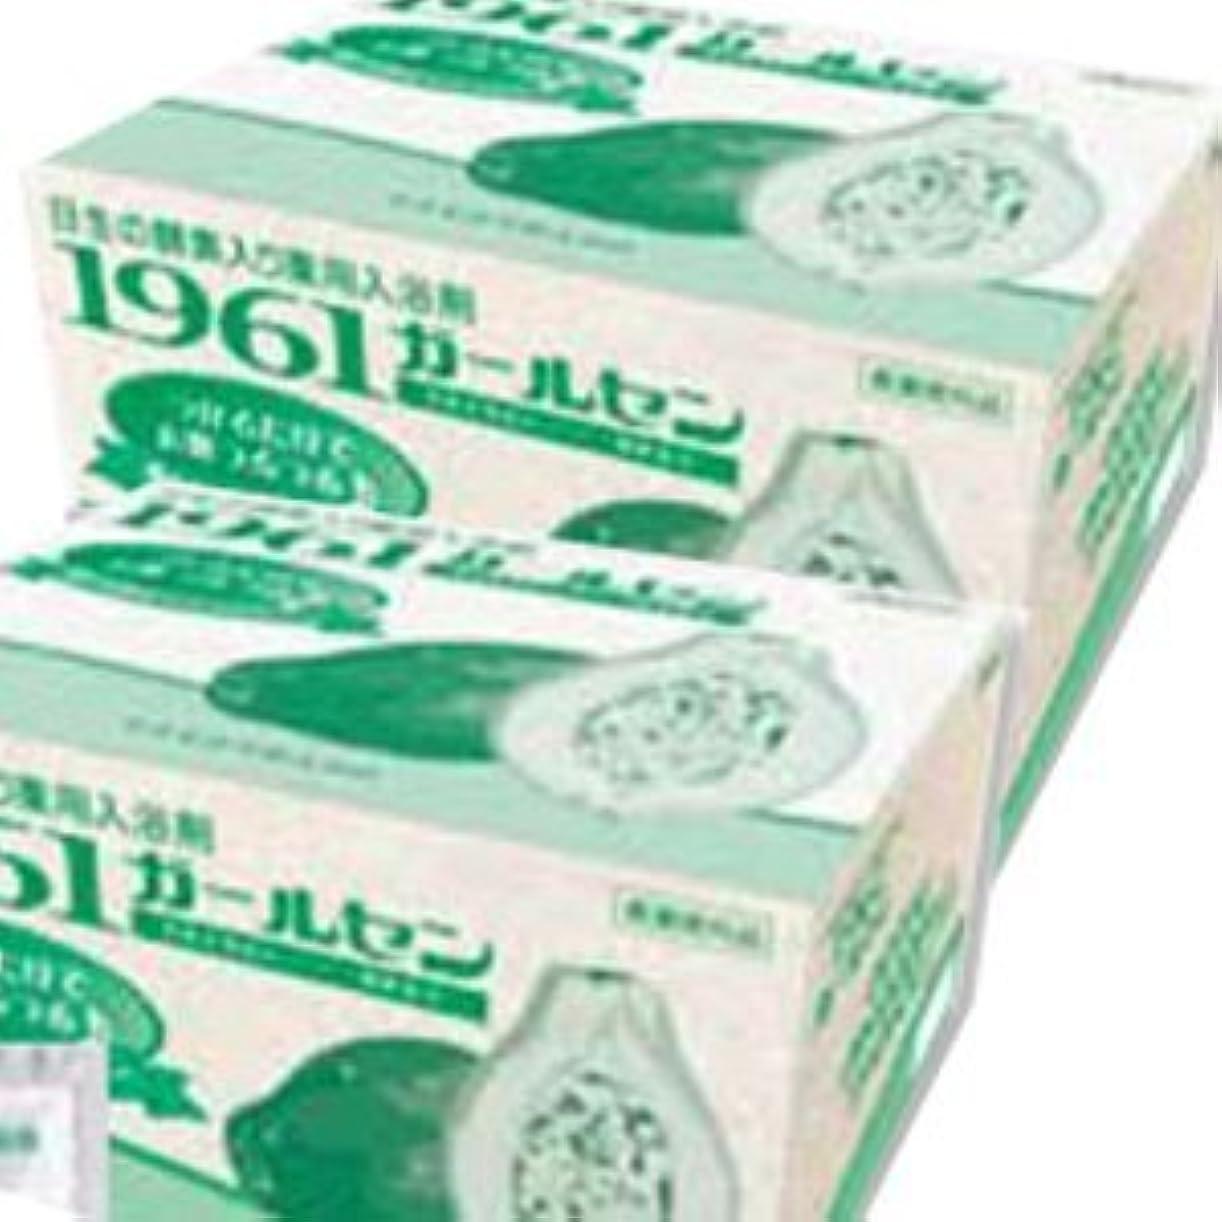 社会主義落とし穴種日本生化学 薬用入浴剤 1961ガールセン (20g×60包)×2箱 (医薬部外品)